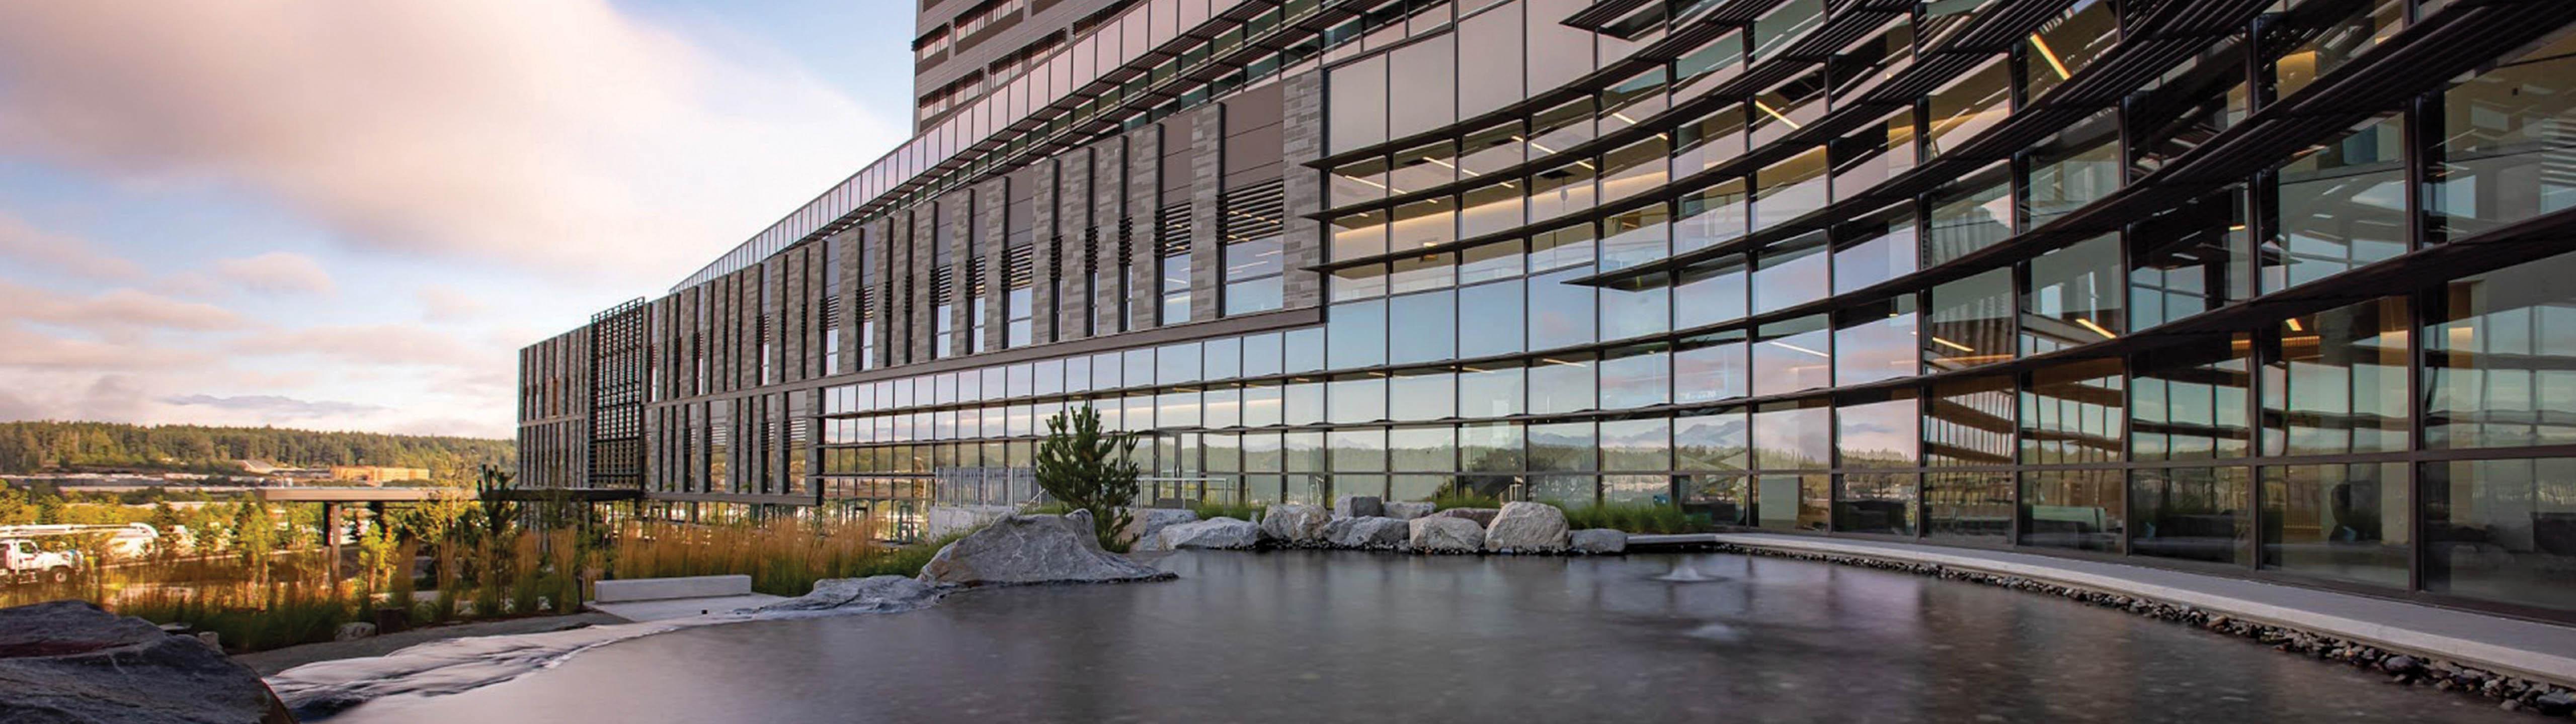 St. Michael Medical Center - Silverdale image